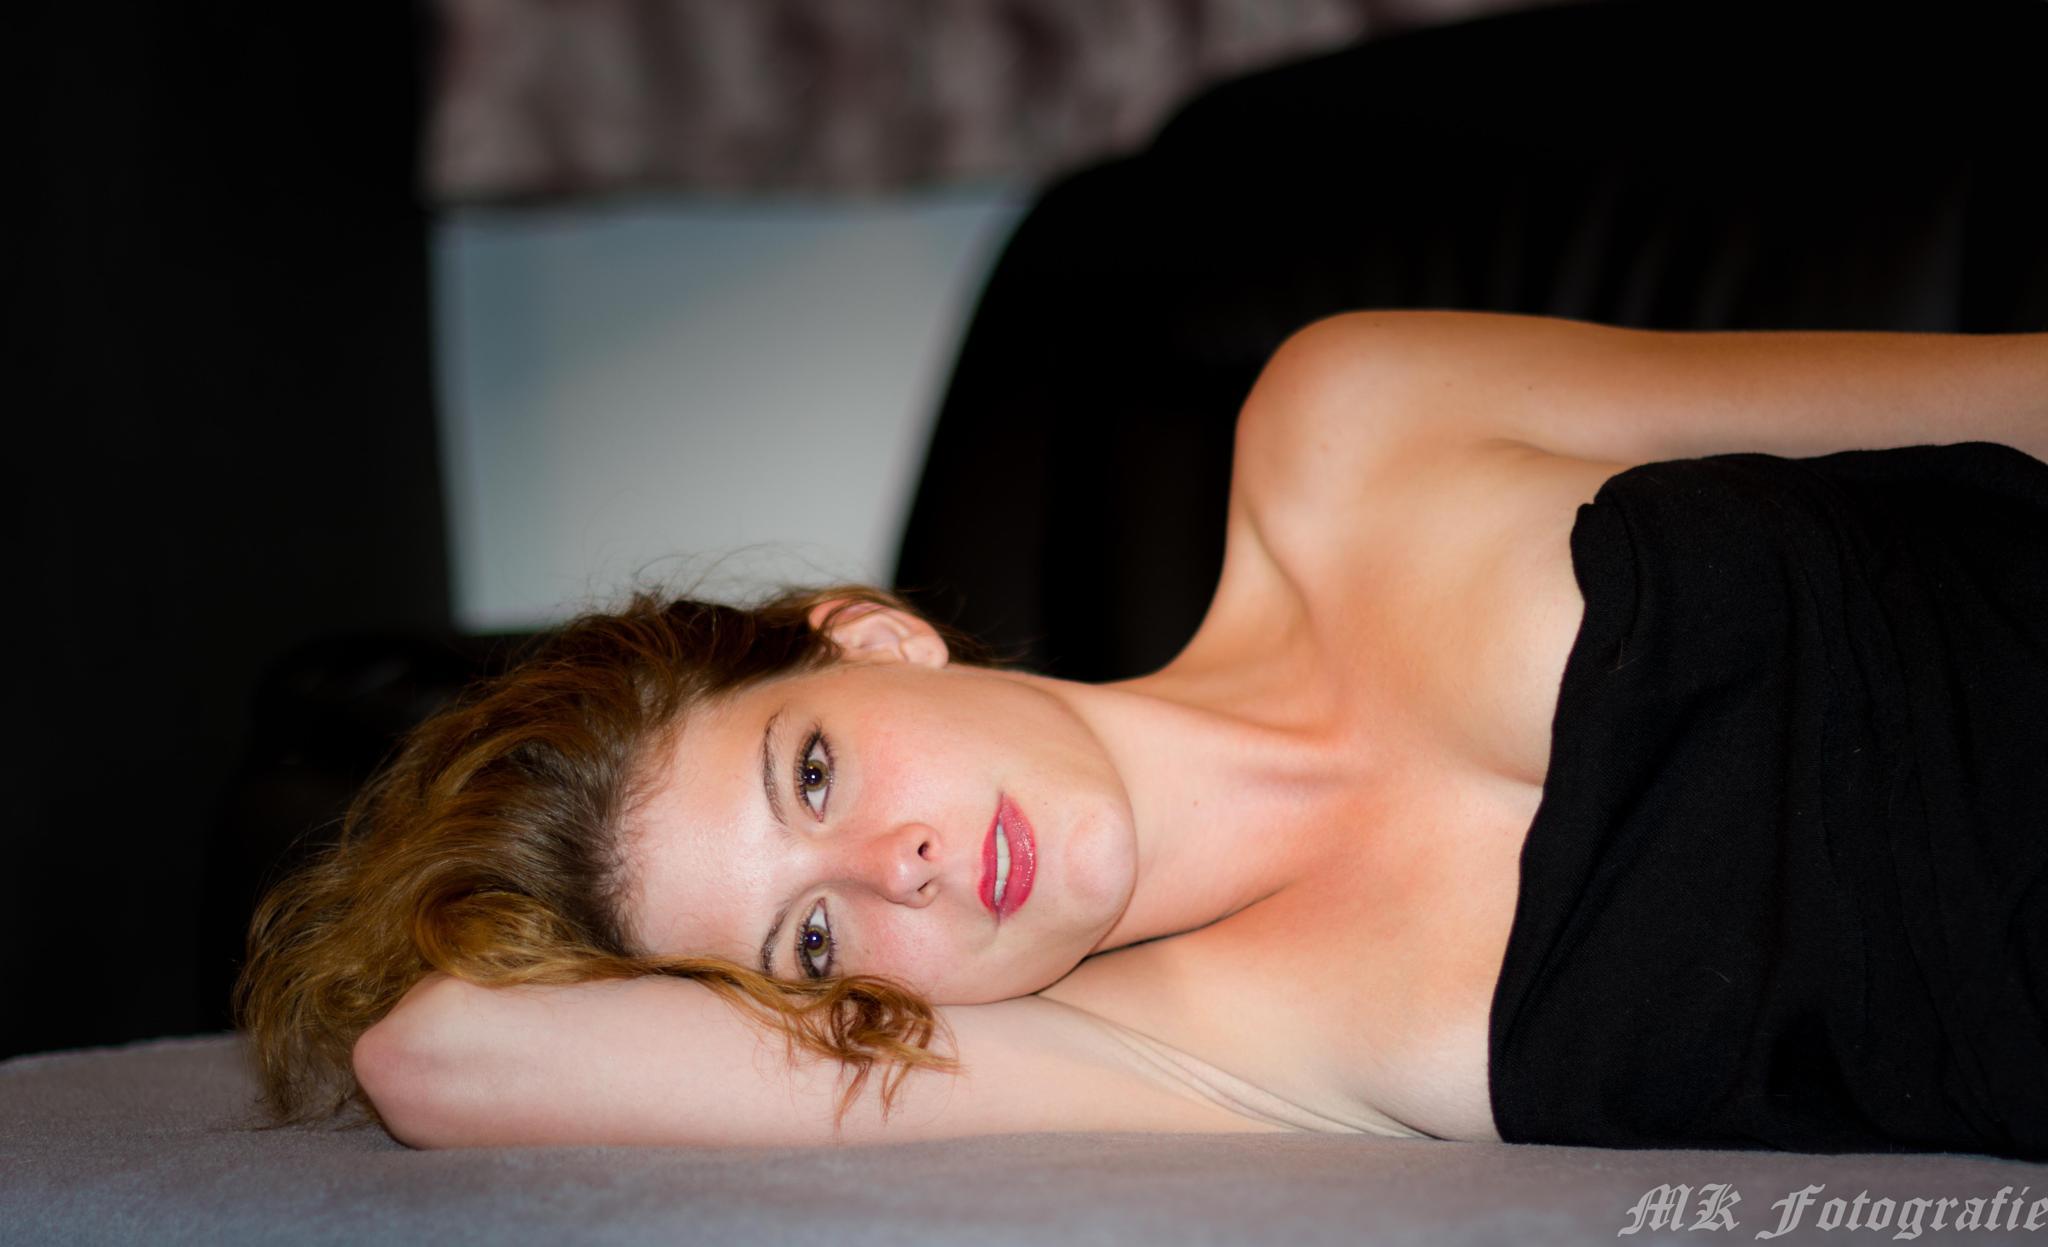 Lara K. by Kronig Fotografie